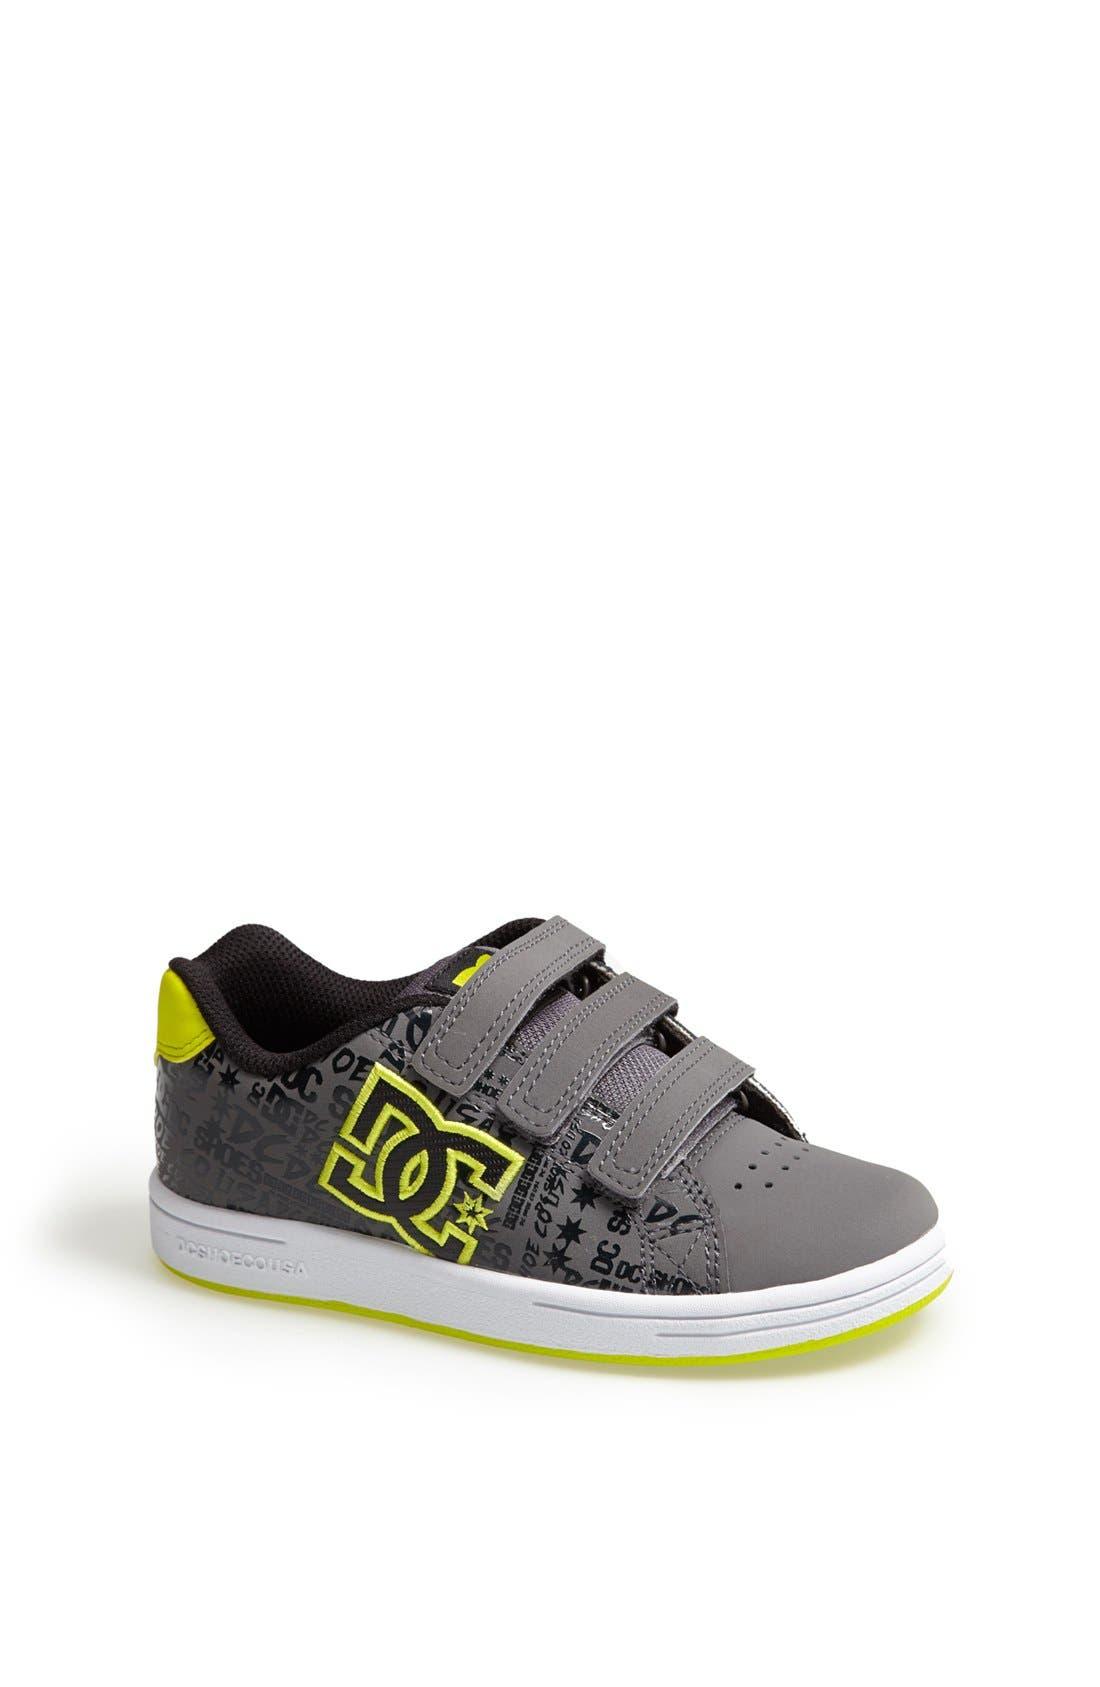 Alternate Image 1 Selected - DC Shoes 'Character V' Sneaker (Toddler & Little Kid)